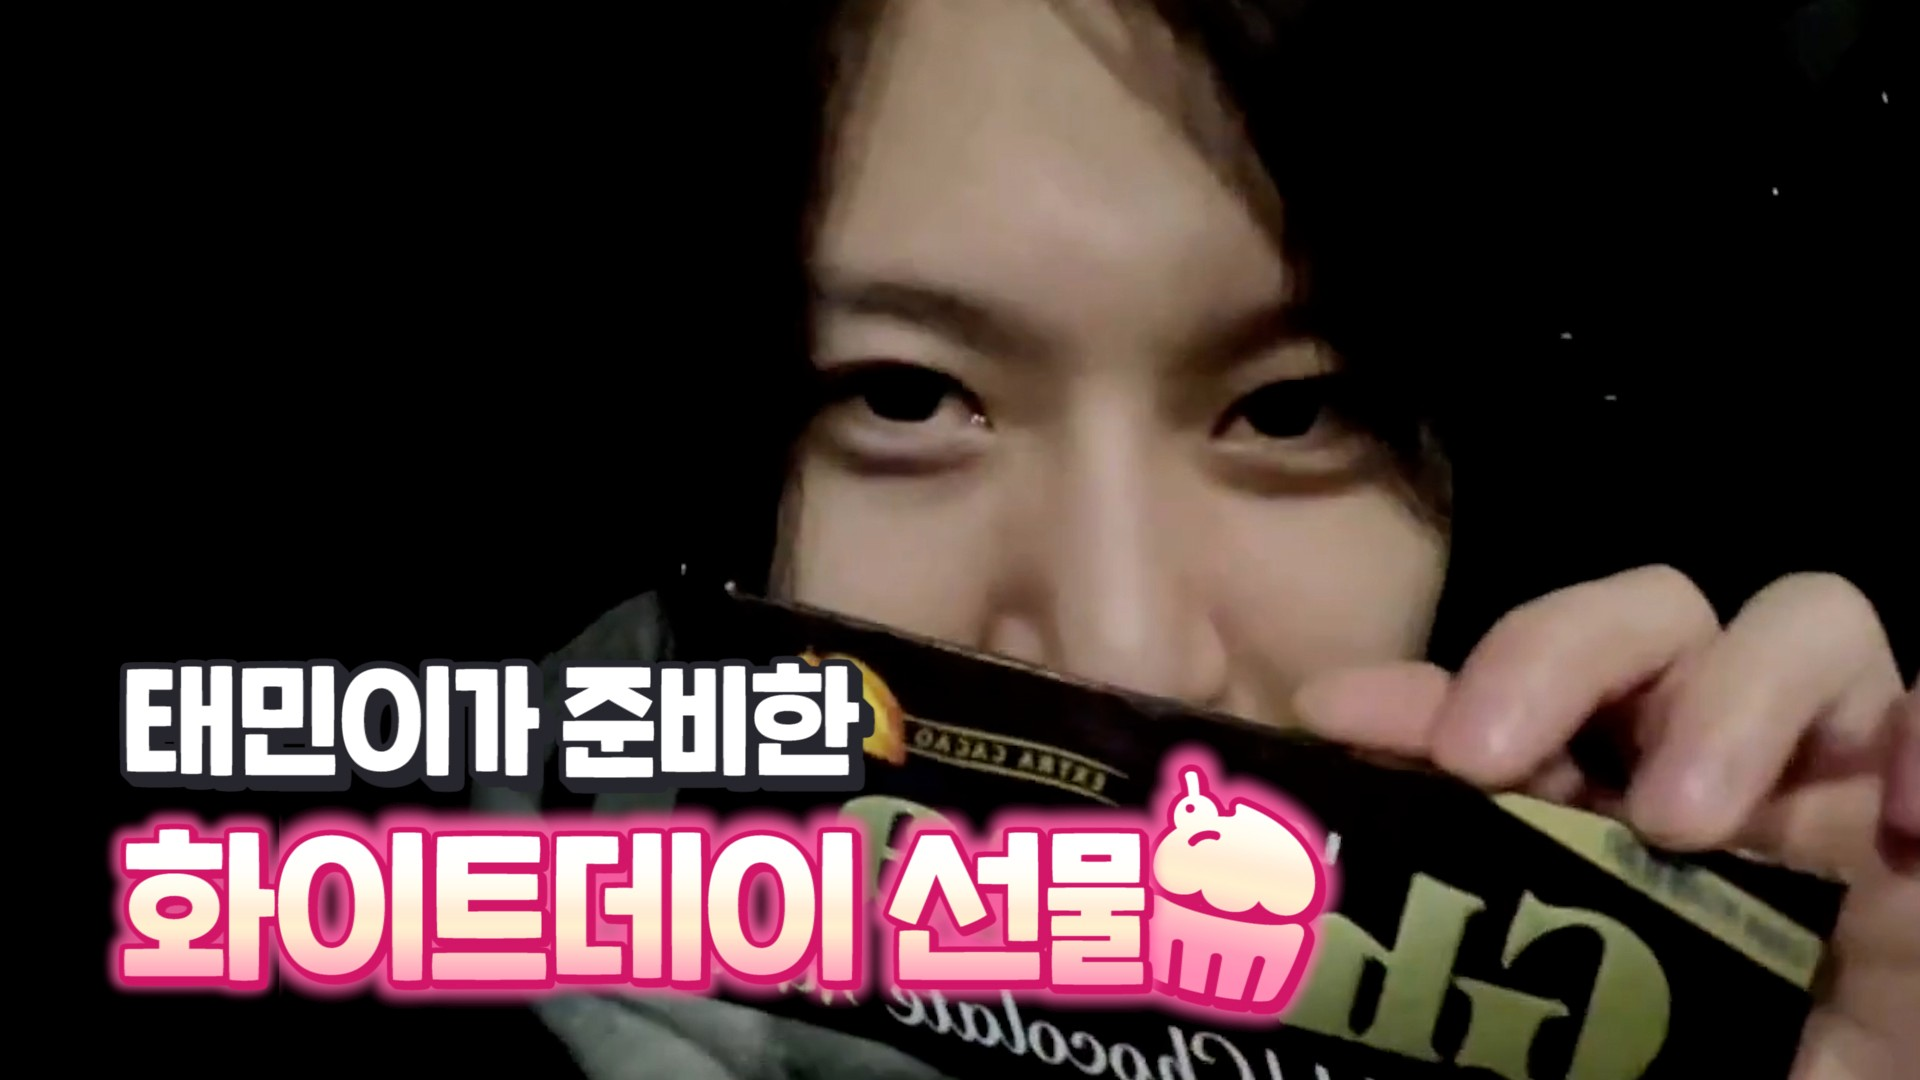 [SHINee] 존재가 선물인 탬니가 준비한 화이트데이 선물🍫💝 (TAEMIN giving chocolate as a gift)